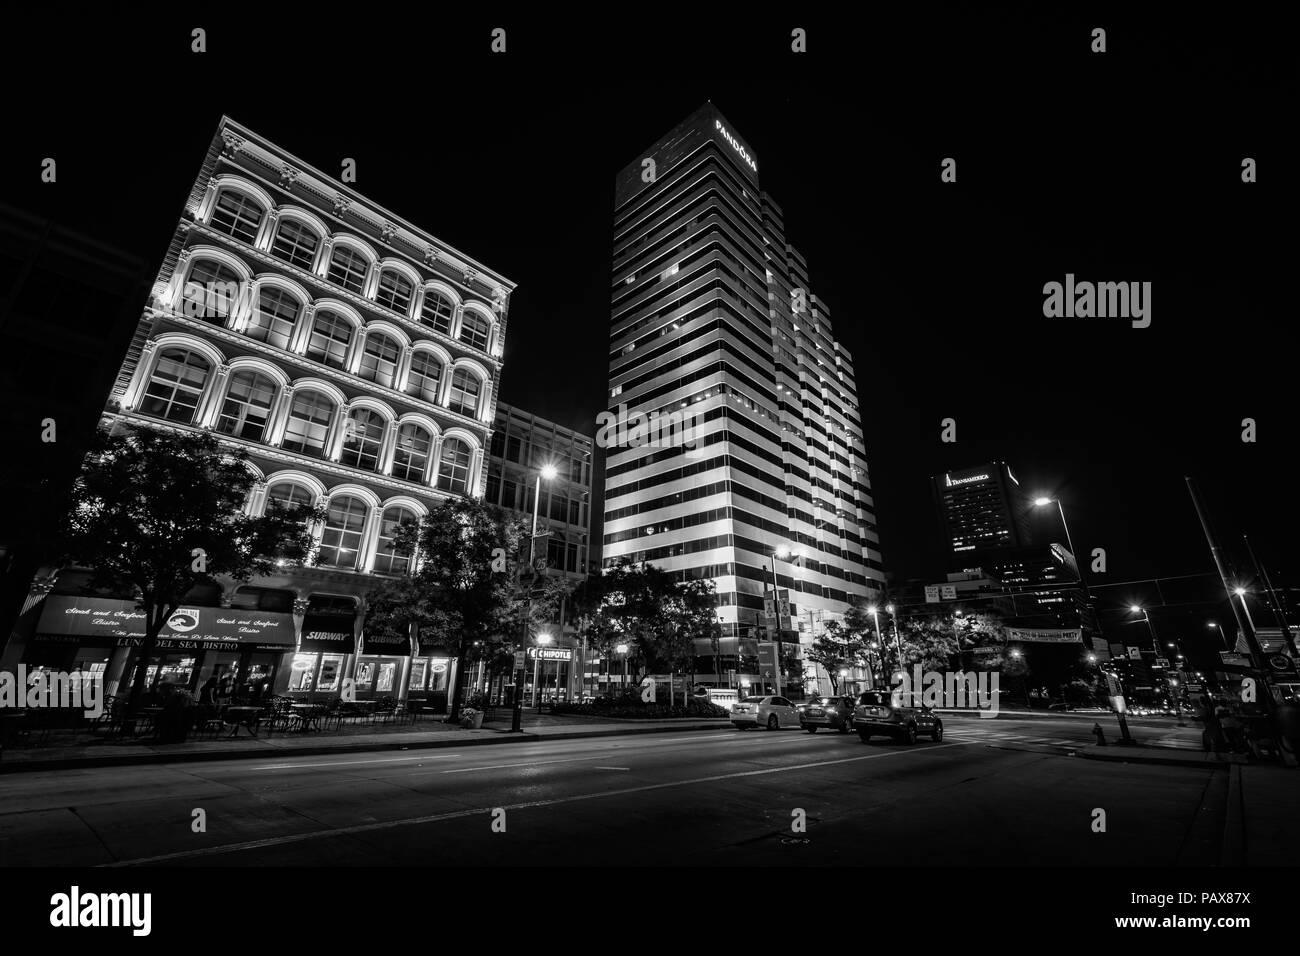 Pratt Black and White Stock Photos & Images - Alamy